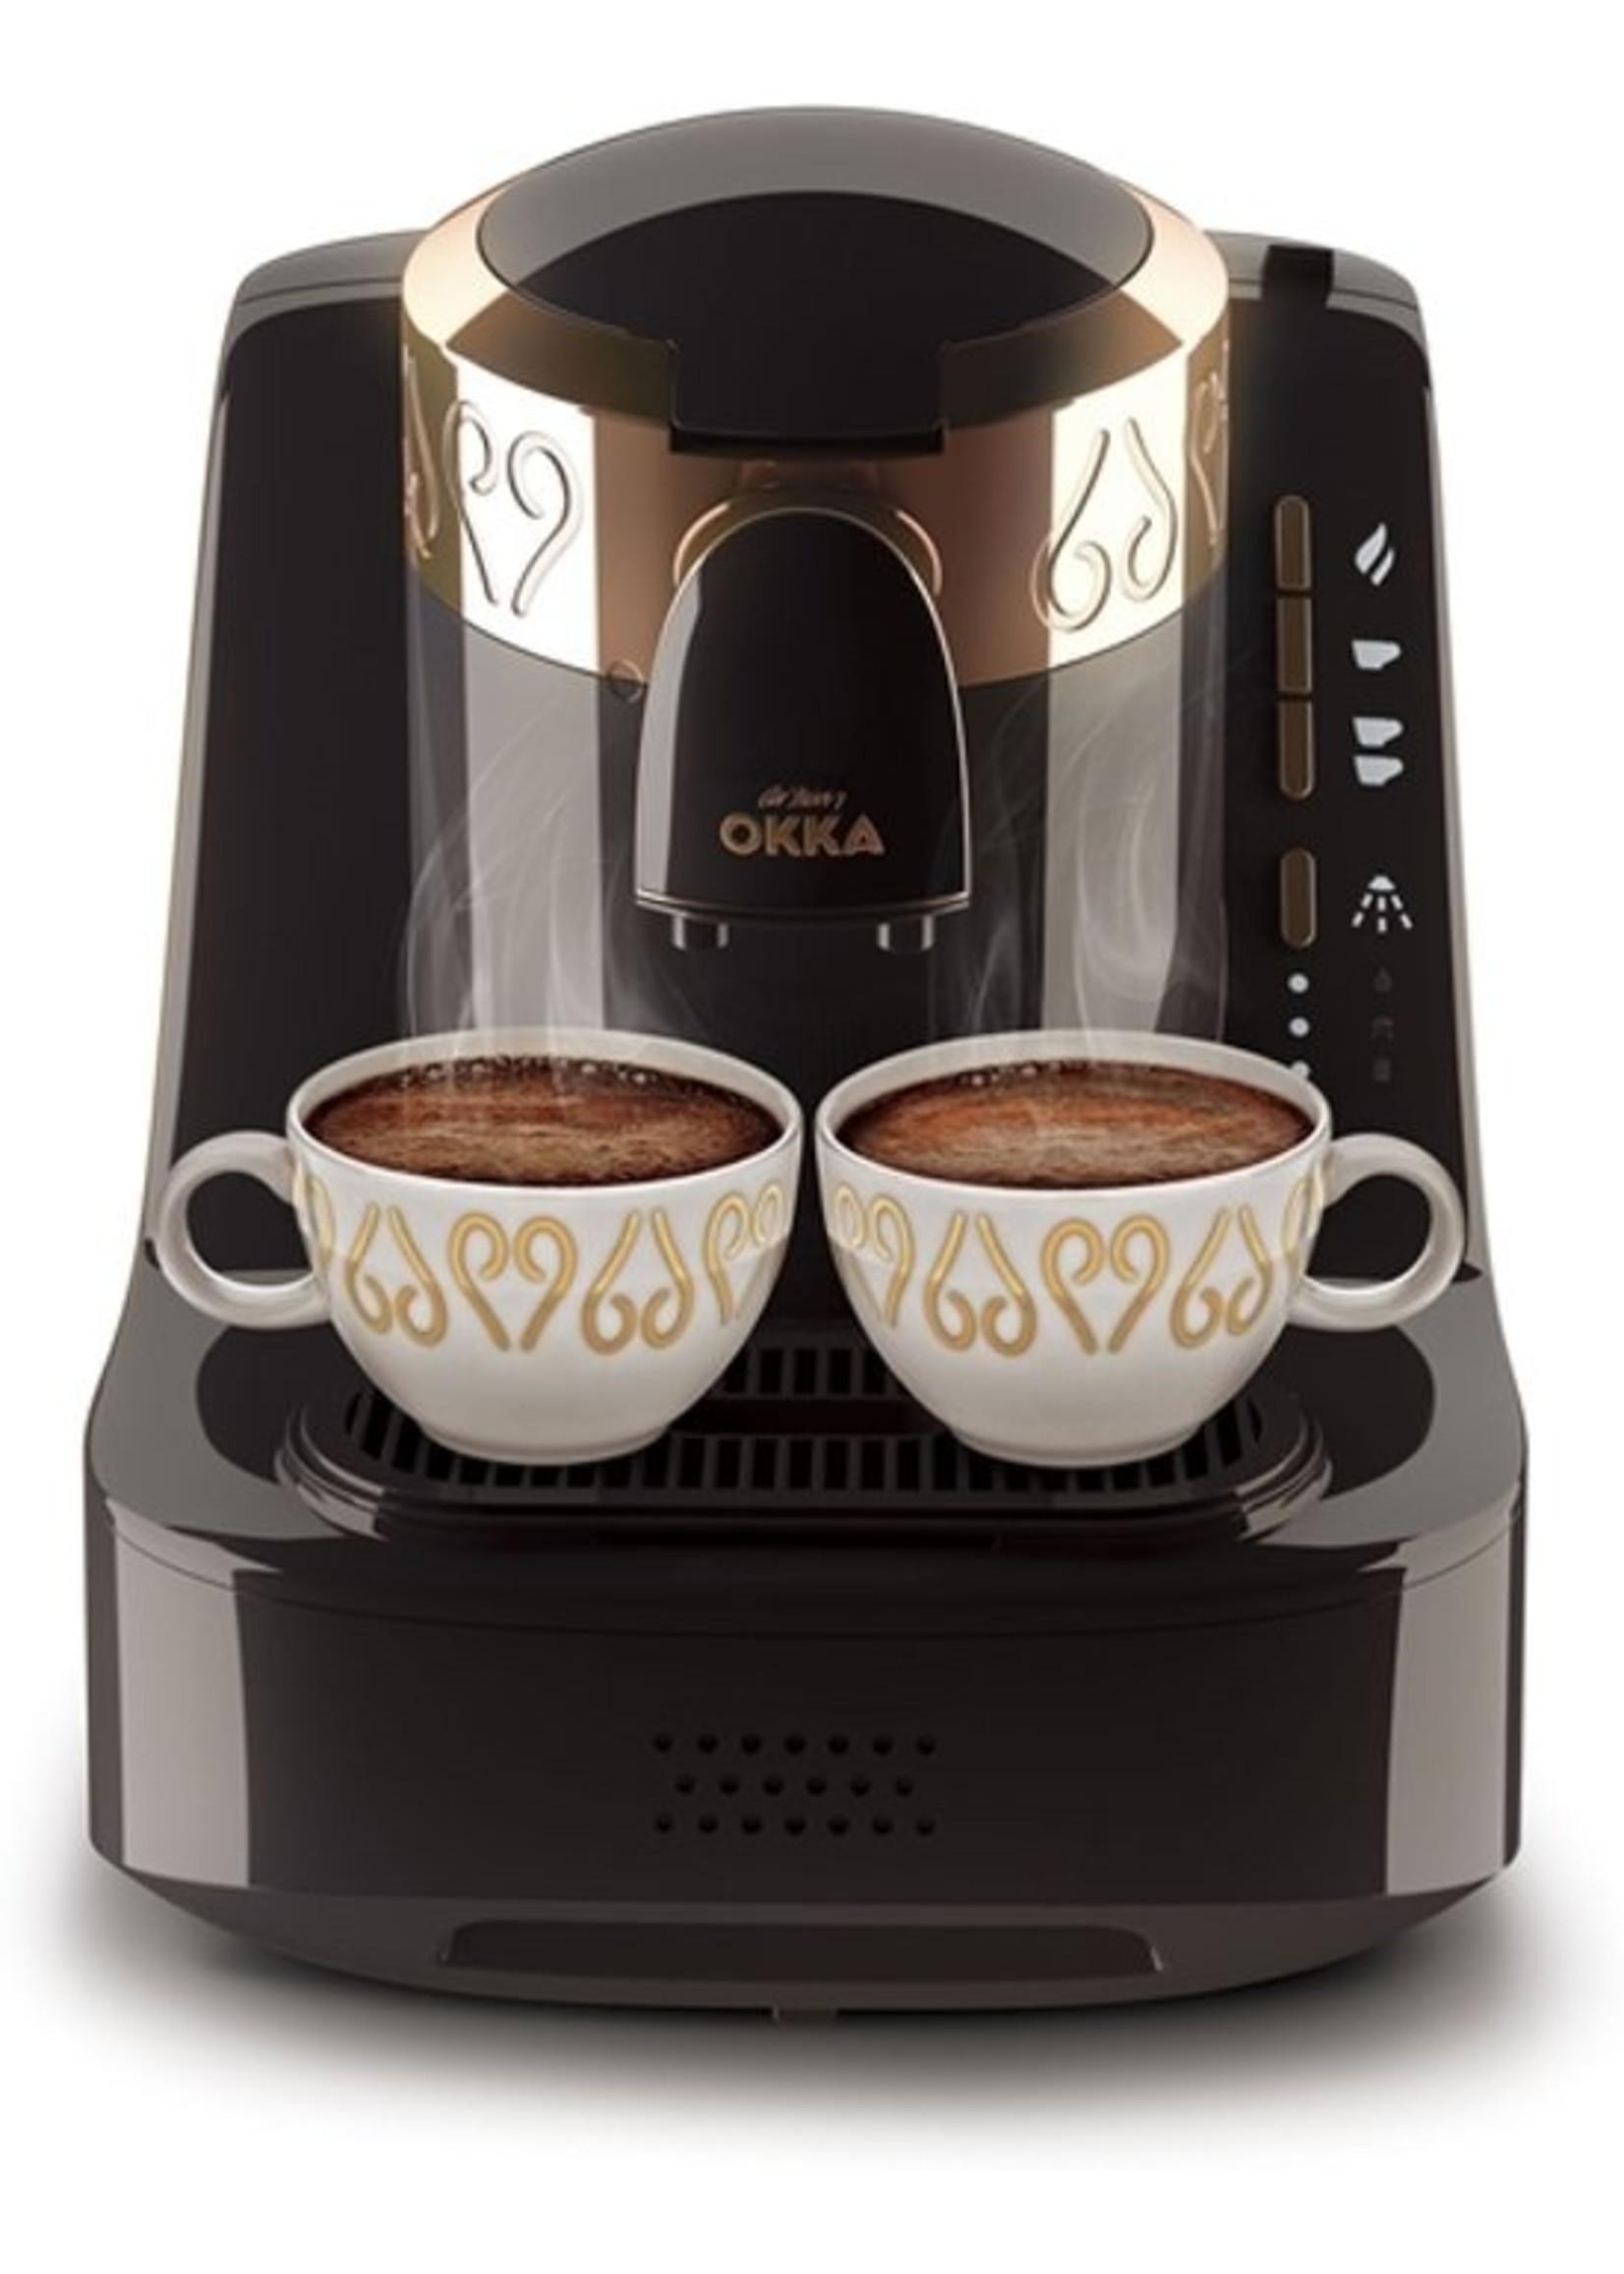 Arzum Arzum Okka Turks koffiezetapparaat 0.95l Zwart, Brons